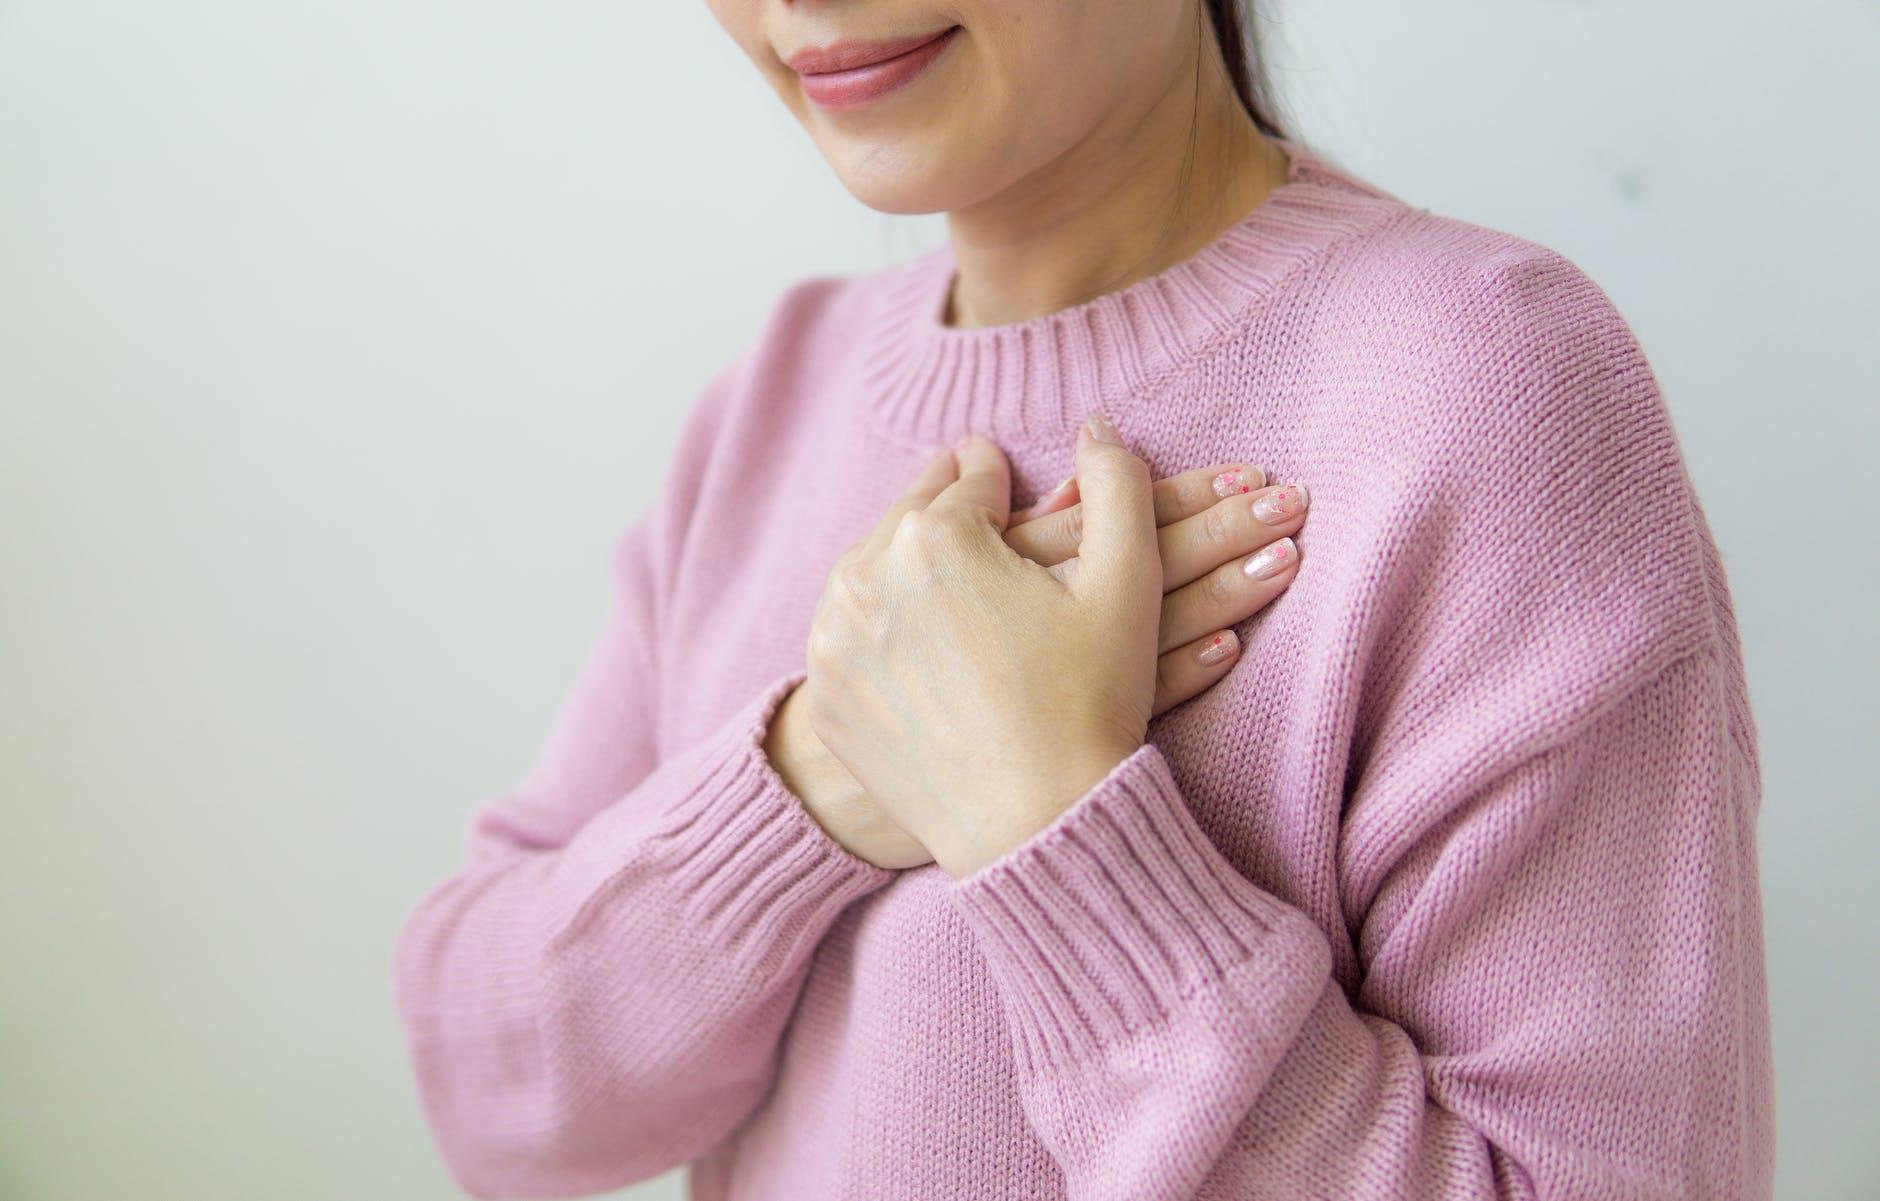 Como a Dor Emocional afeta seu Corpo